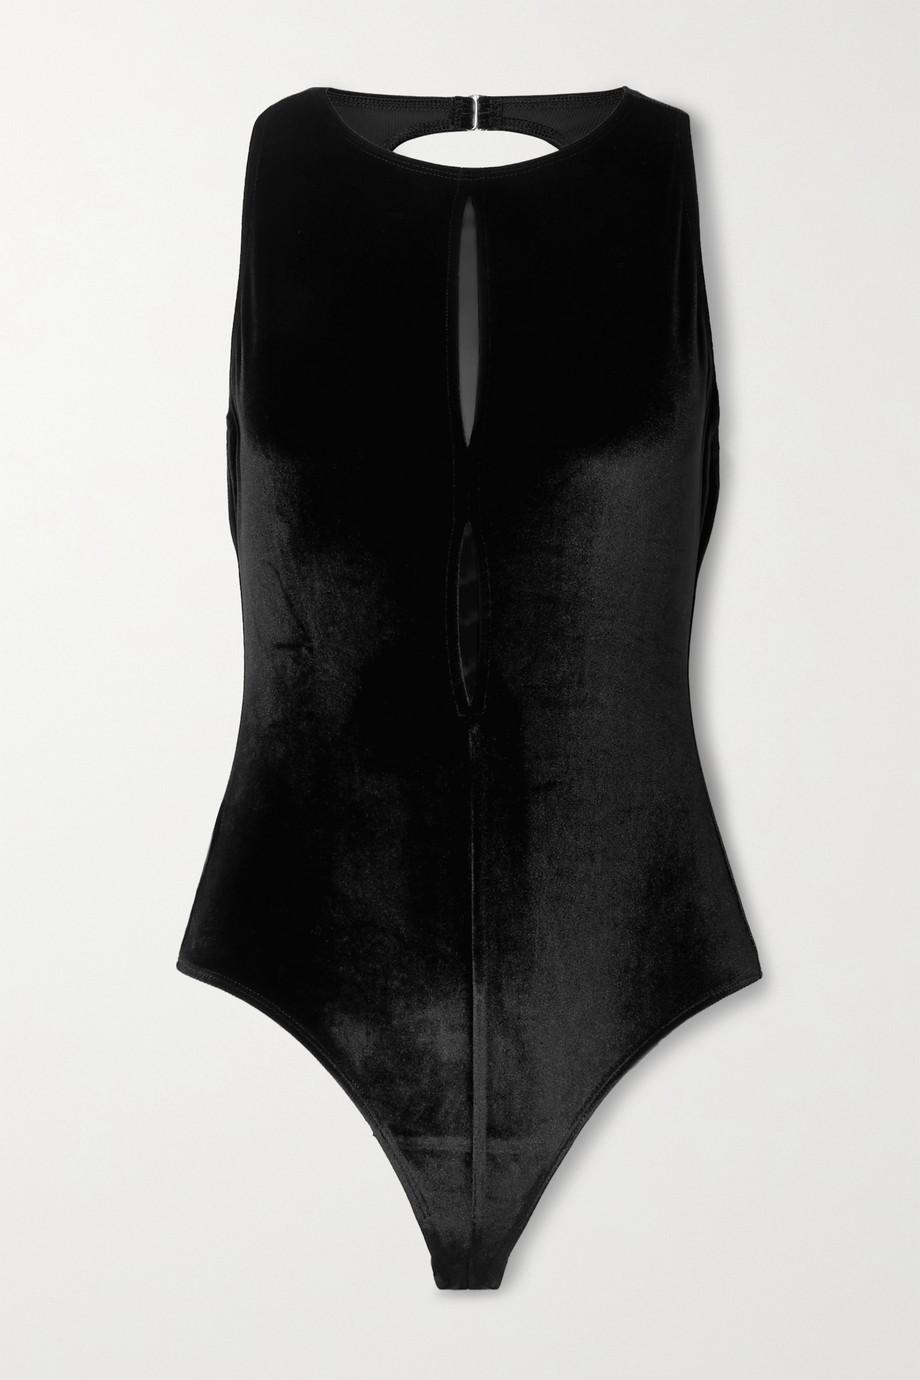 Marika Vera Charlize cutout velvet thong bodysuit